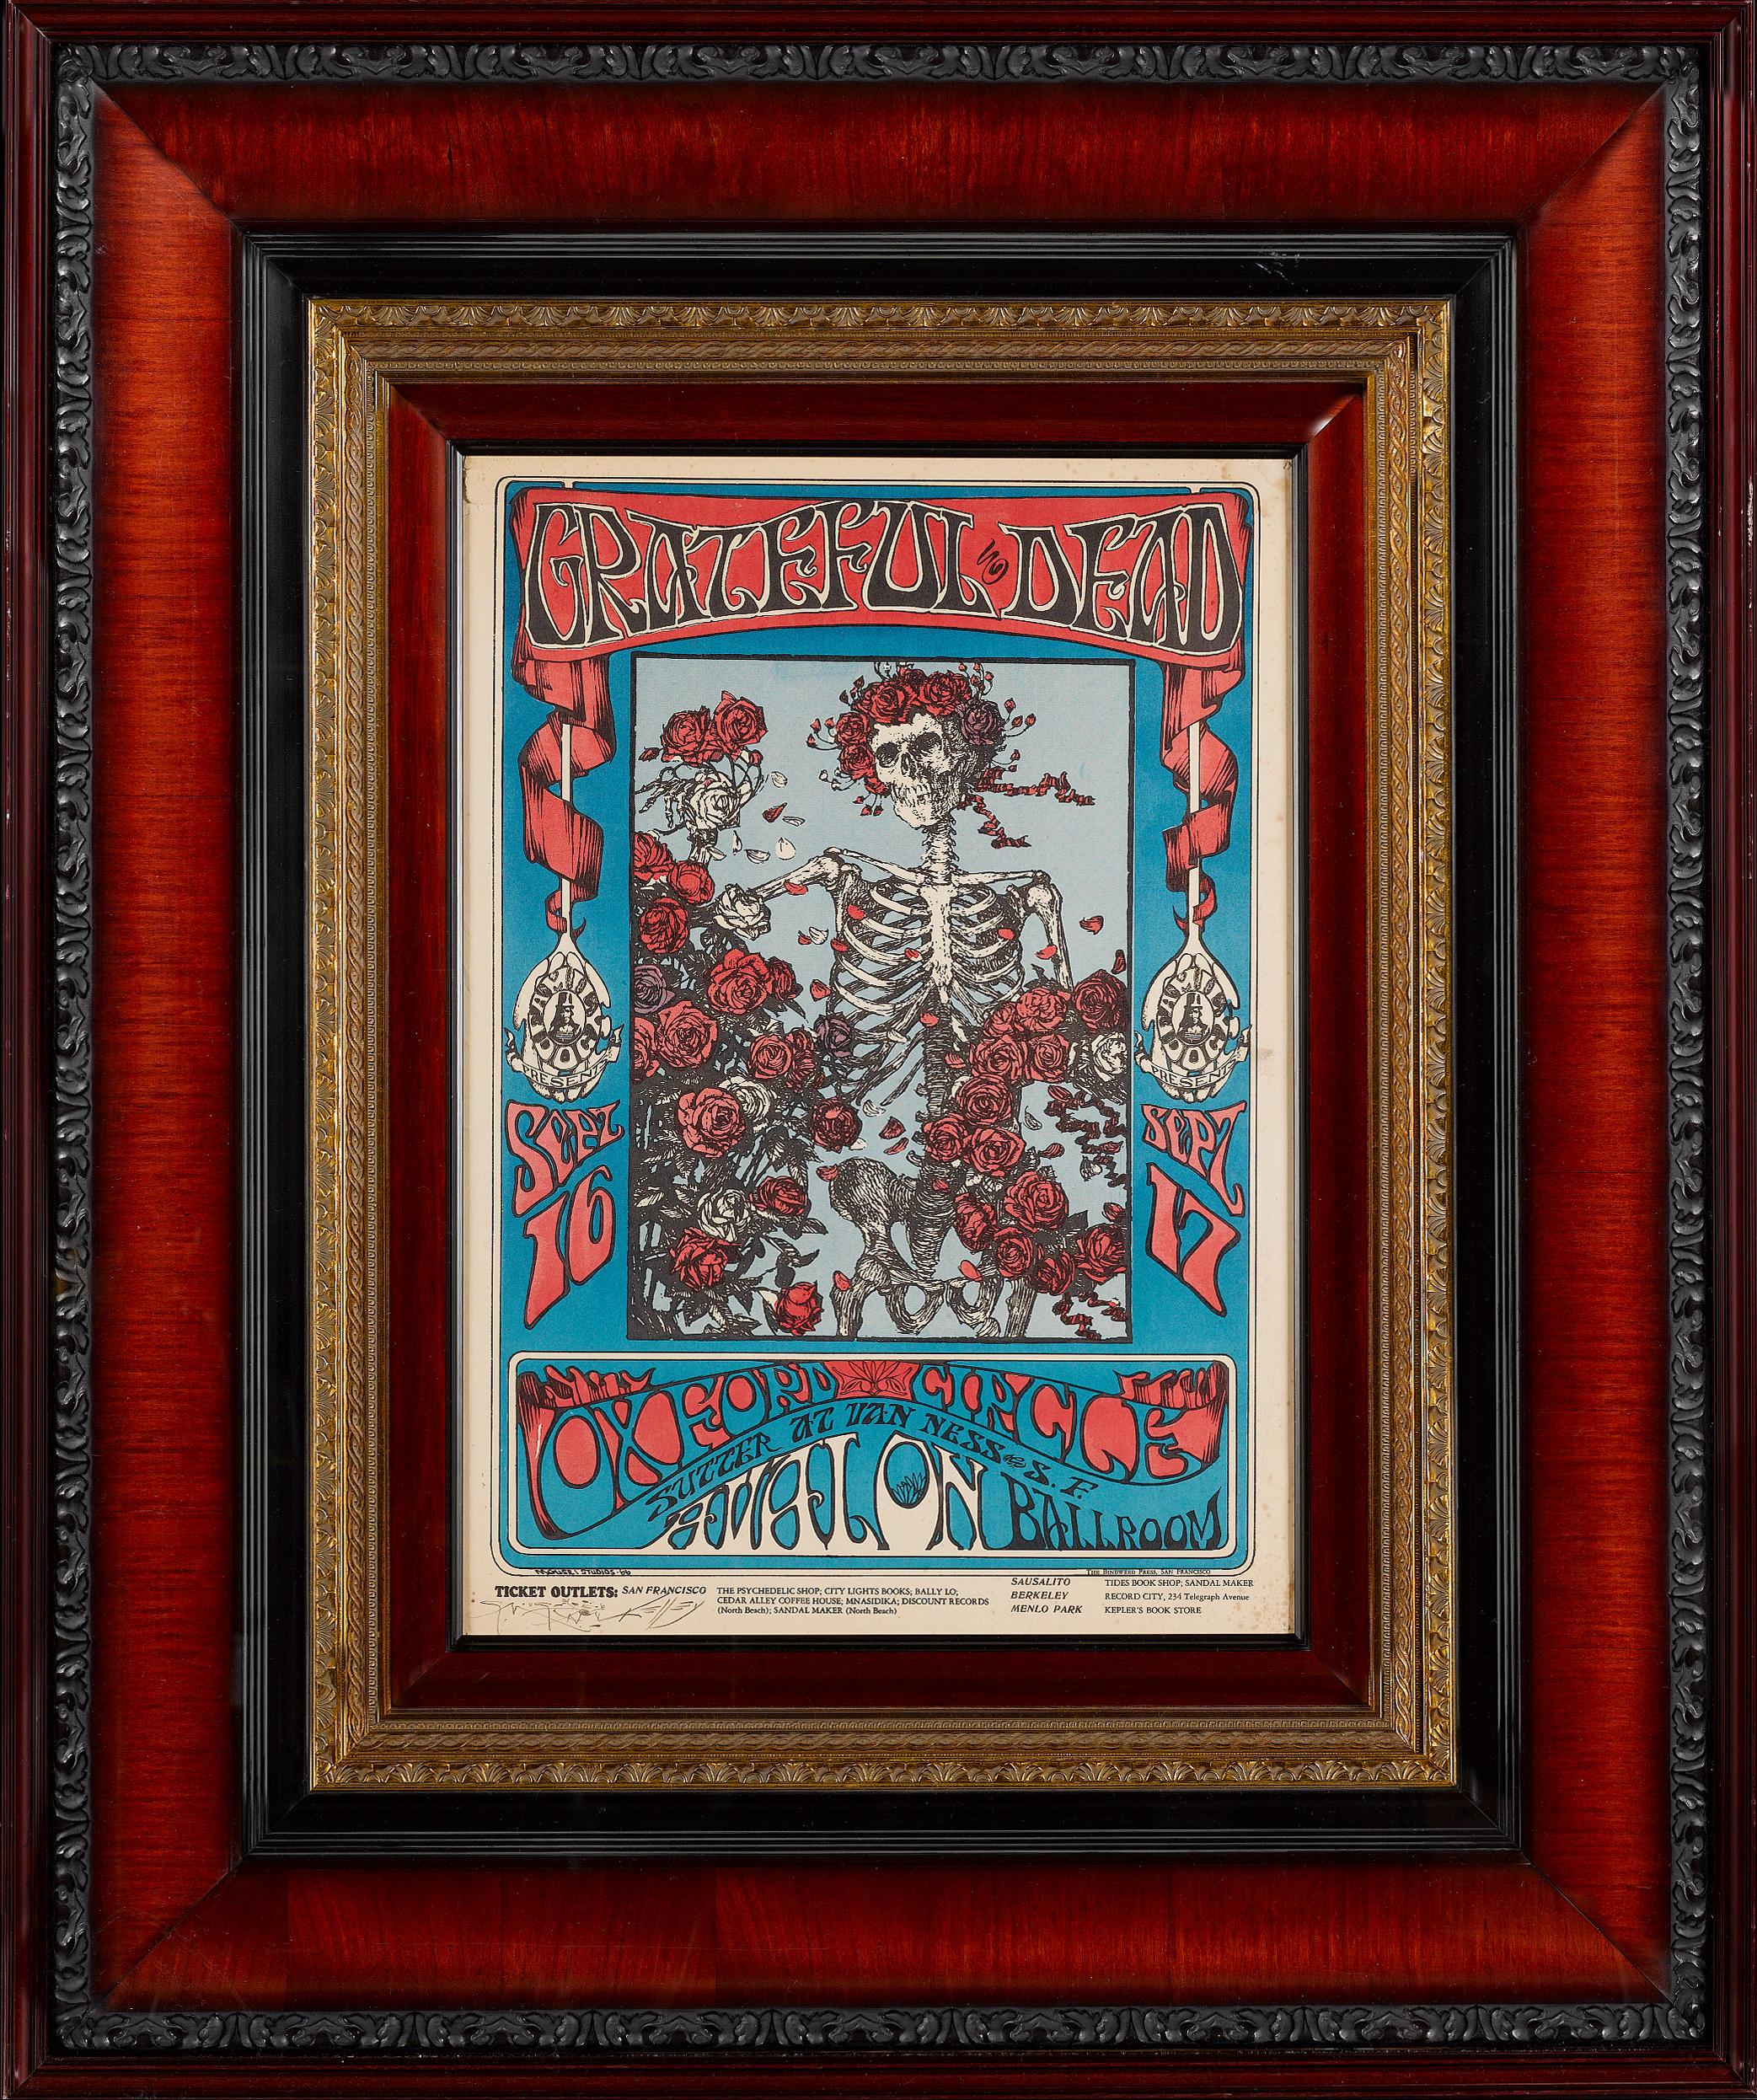 1966 concert poster Grateful Dead Skeleton and Roses Avalon Ballroom